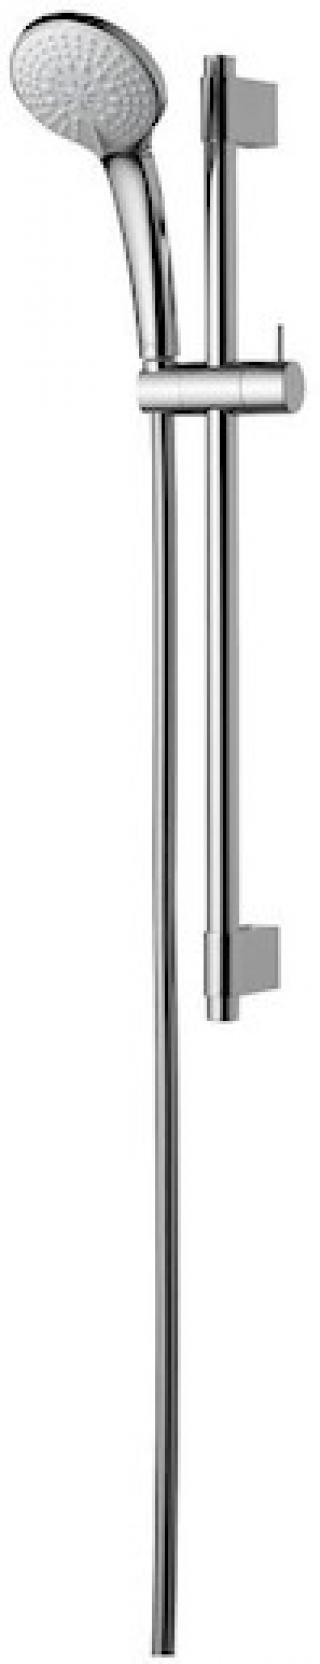 Sprchový set Ideal Standard Idealrain Pro na stěnu chrom B9834AA chrom chrom